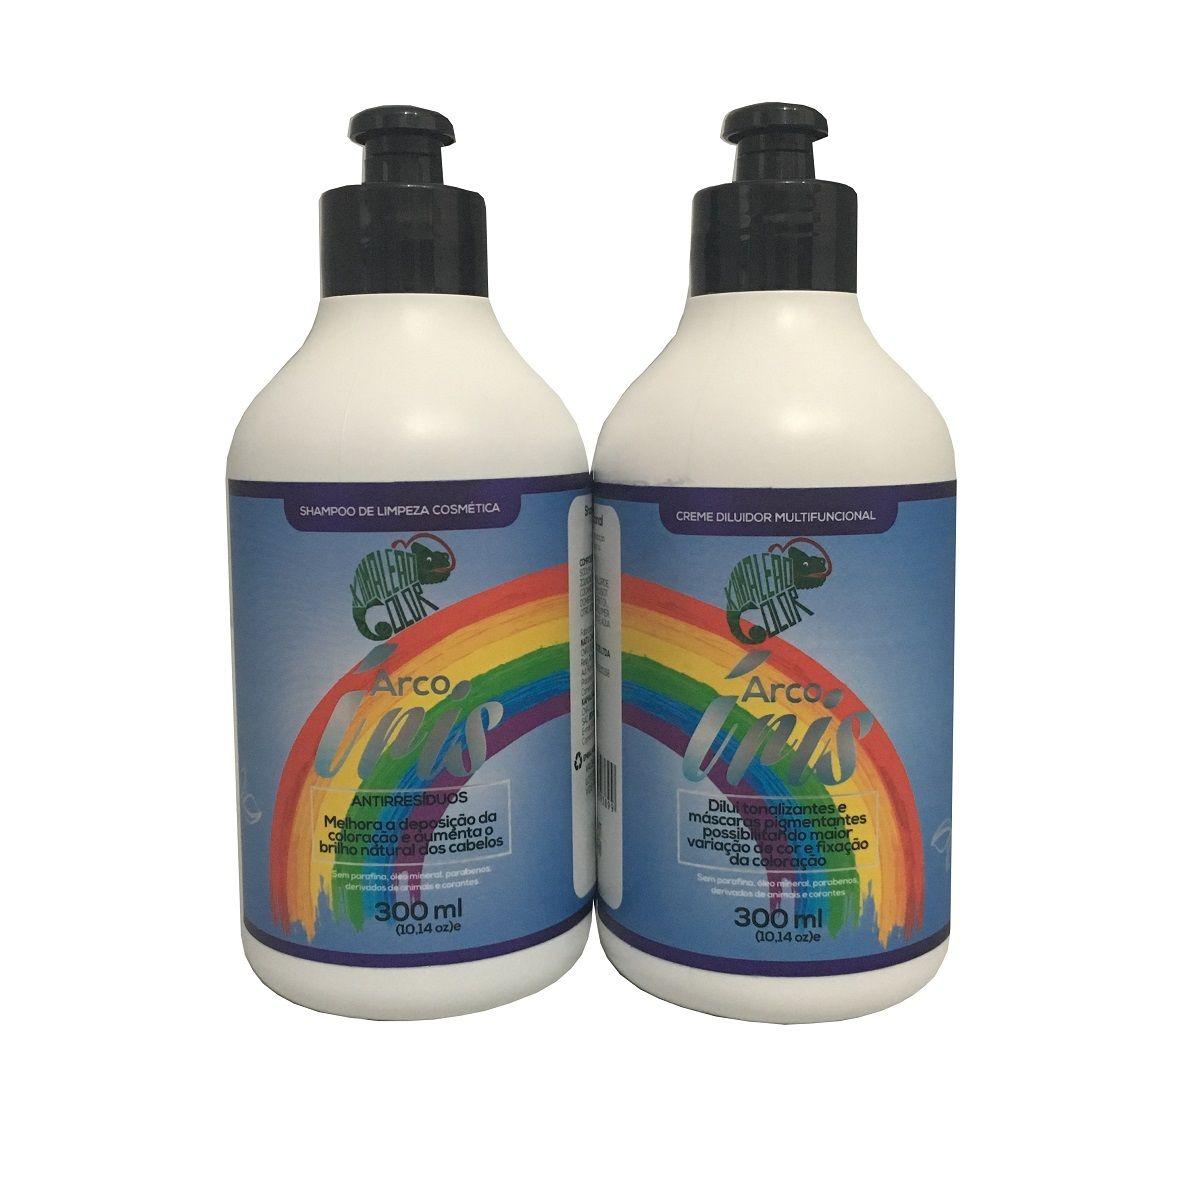 Kamaleão Kit Arco Íris - Shampoo de Limpeza e Creme Diluidor